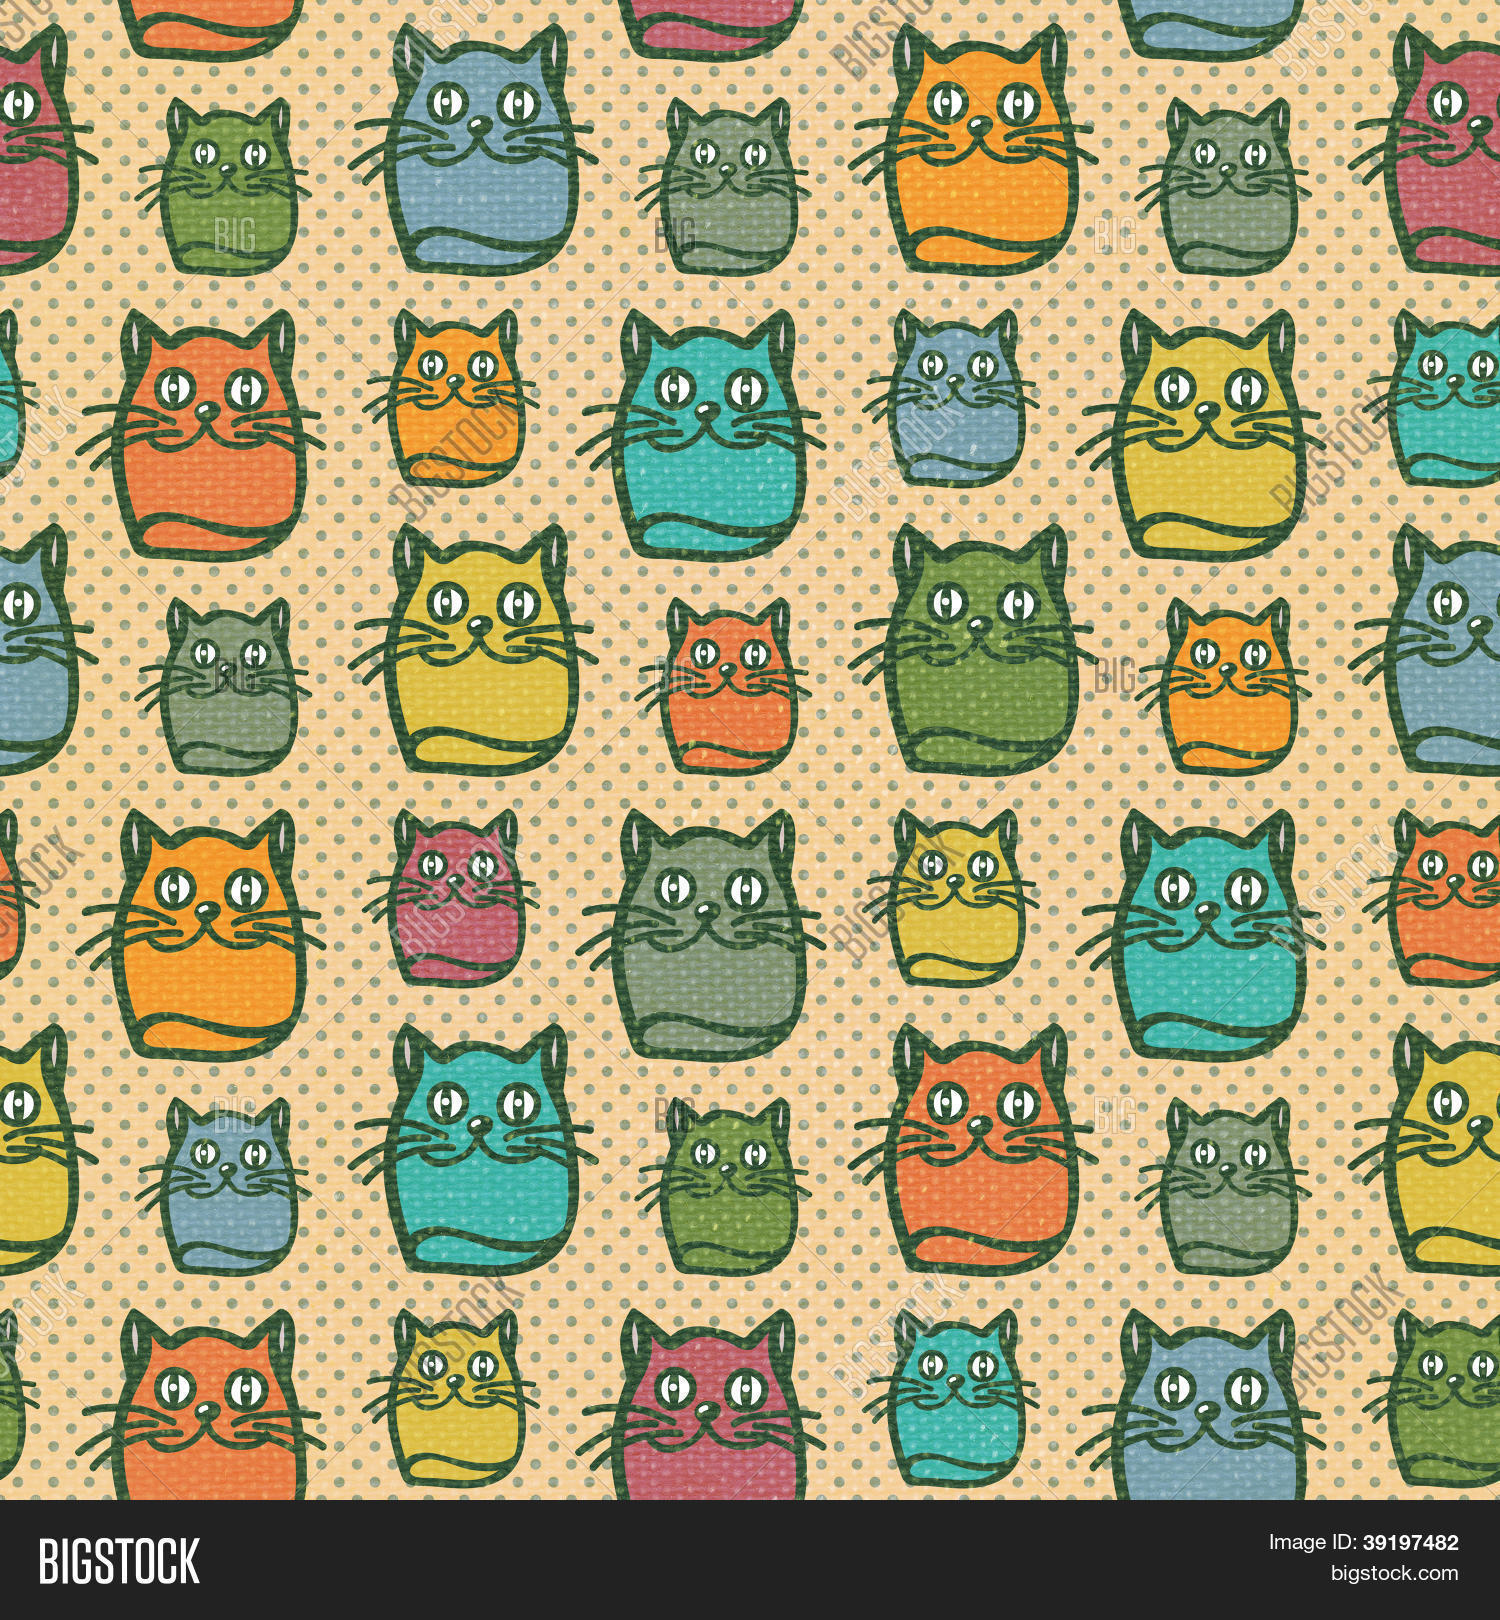 Fun cat seamless wallpaper image photo bigstock for Fun pattern wallpaper